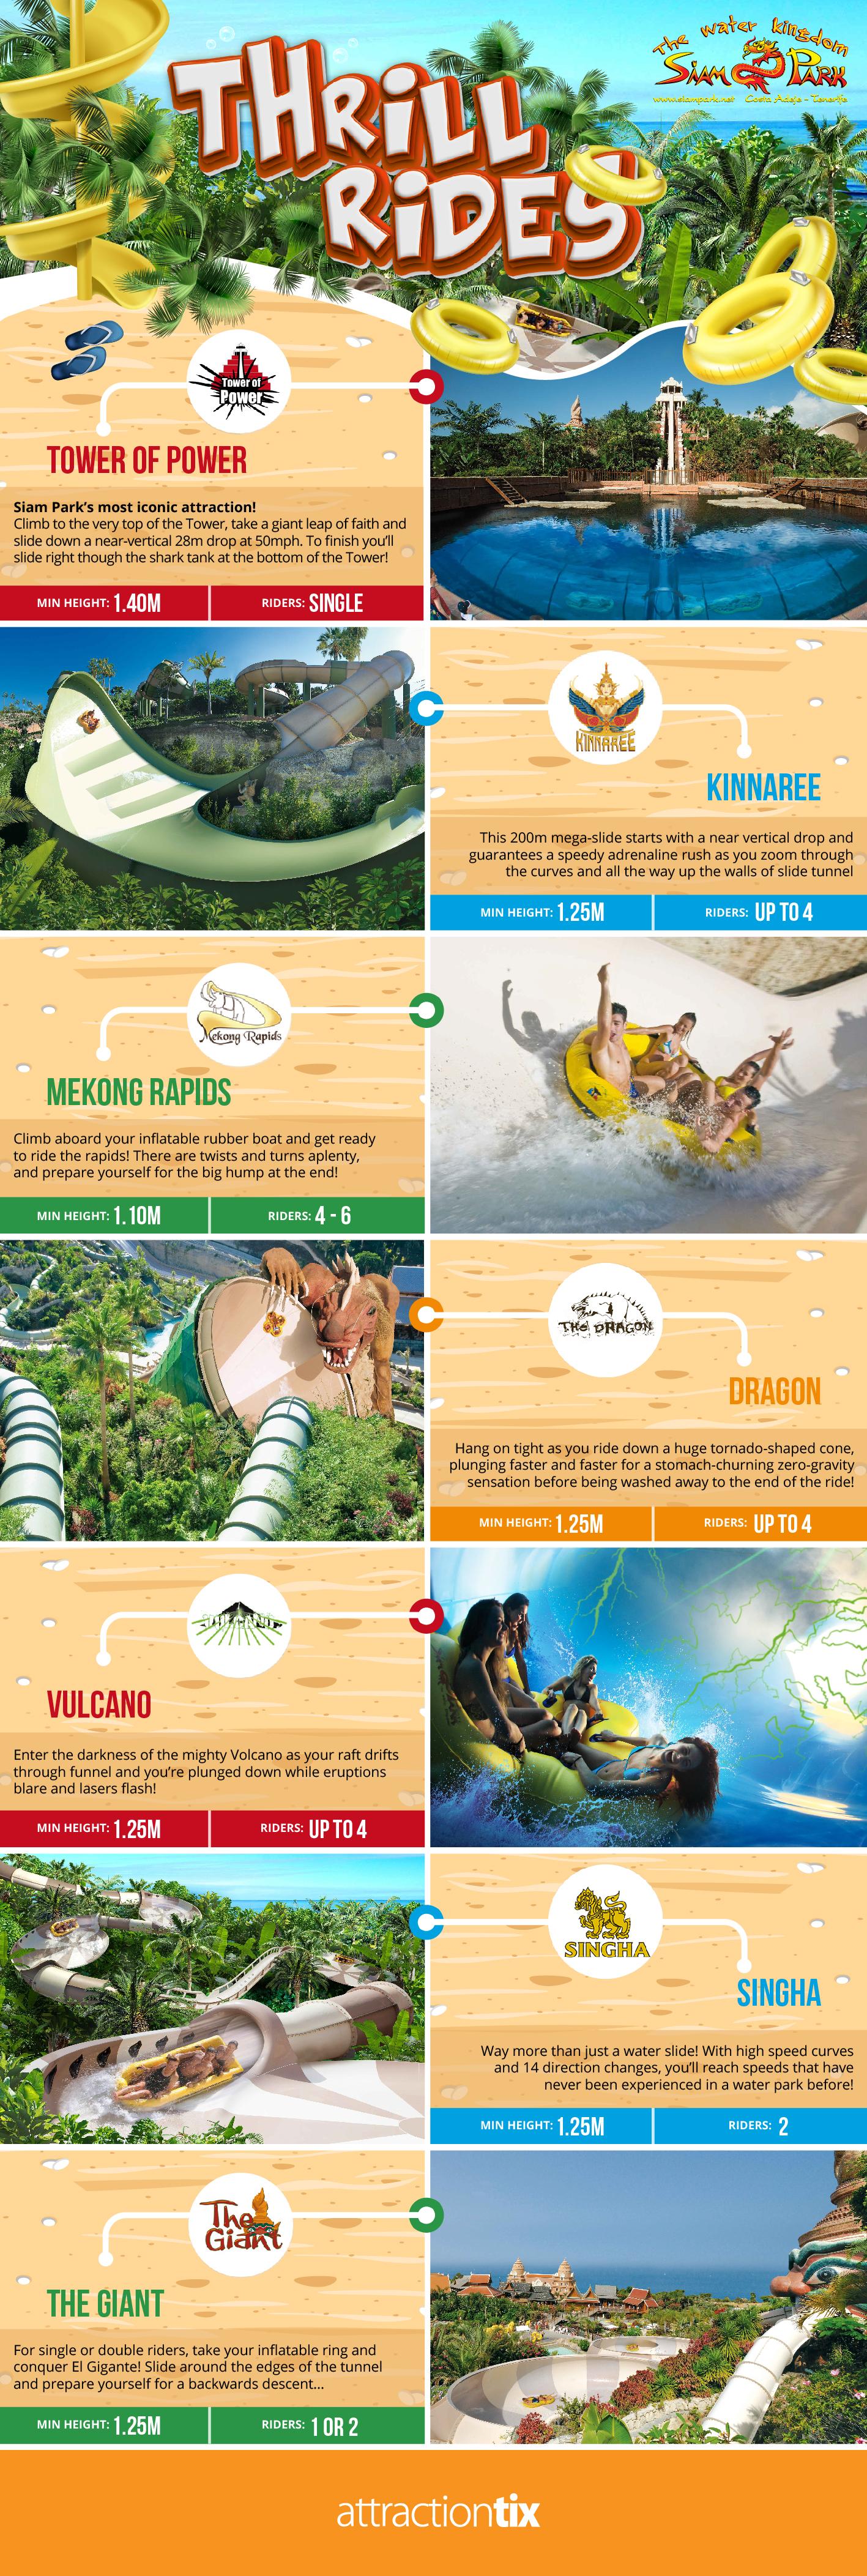 Siam Park Thrill Rides Infographic